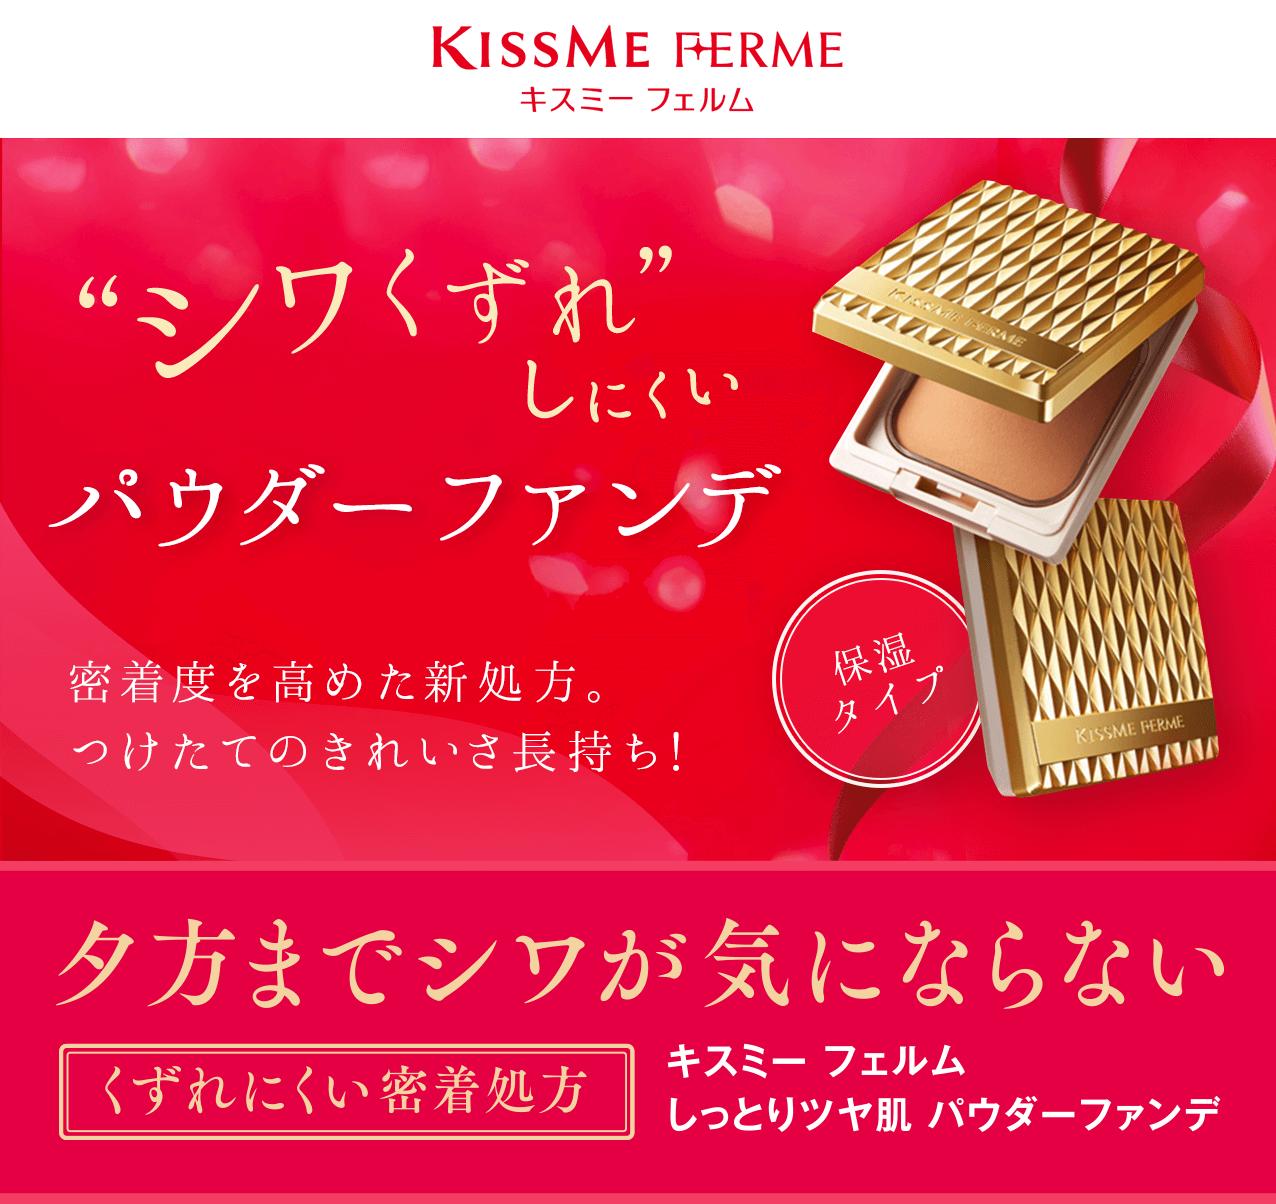 "KISSME FERME ""シワくずれ""しにくいパウダーファンデ 密着度を高めた新処方。つけたての綺麗さ長持ち! ツヤ肌仕上げ 夕方までシワが気にならない 崩れにくい密着処方 KISSME FERME 保湿タイプ"